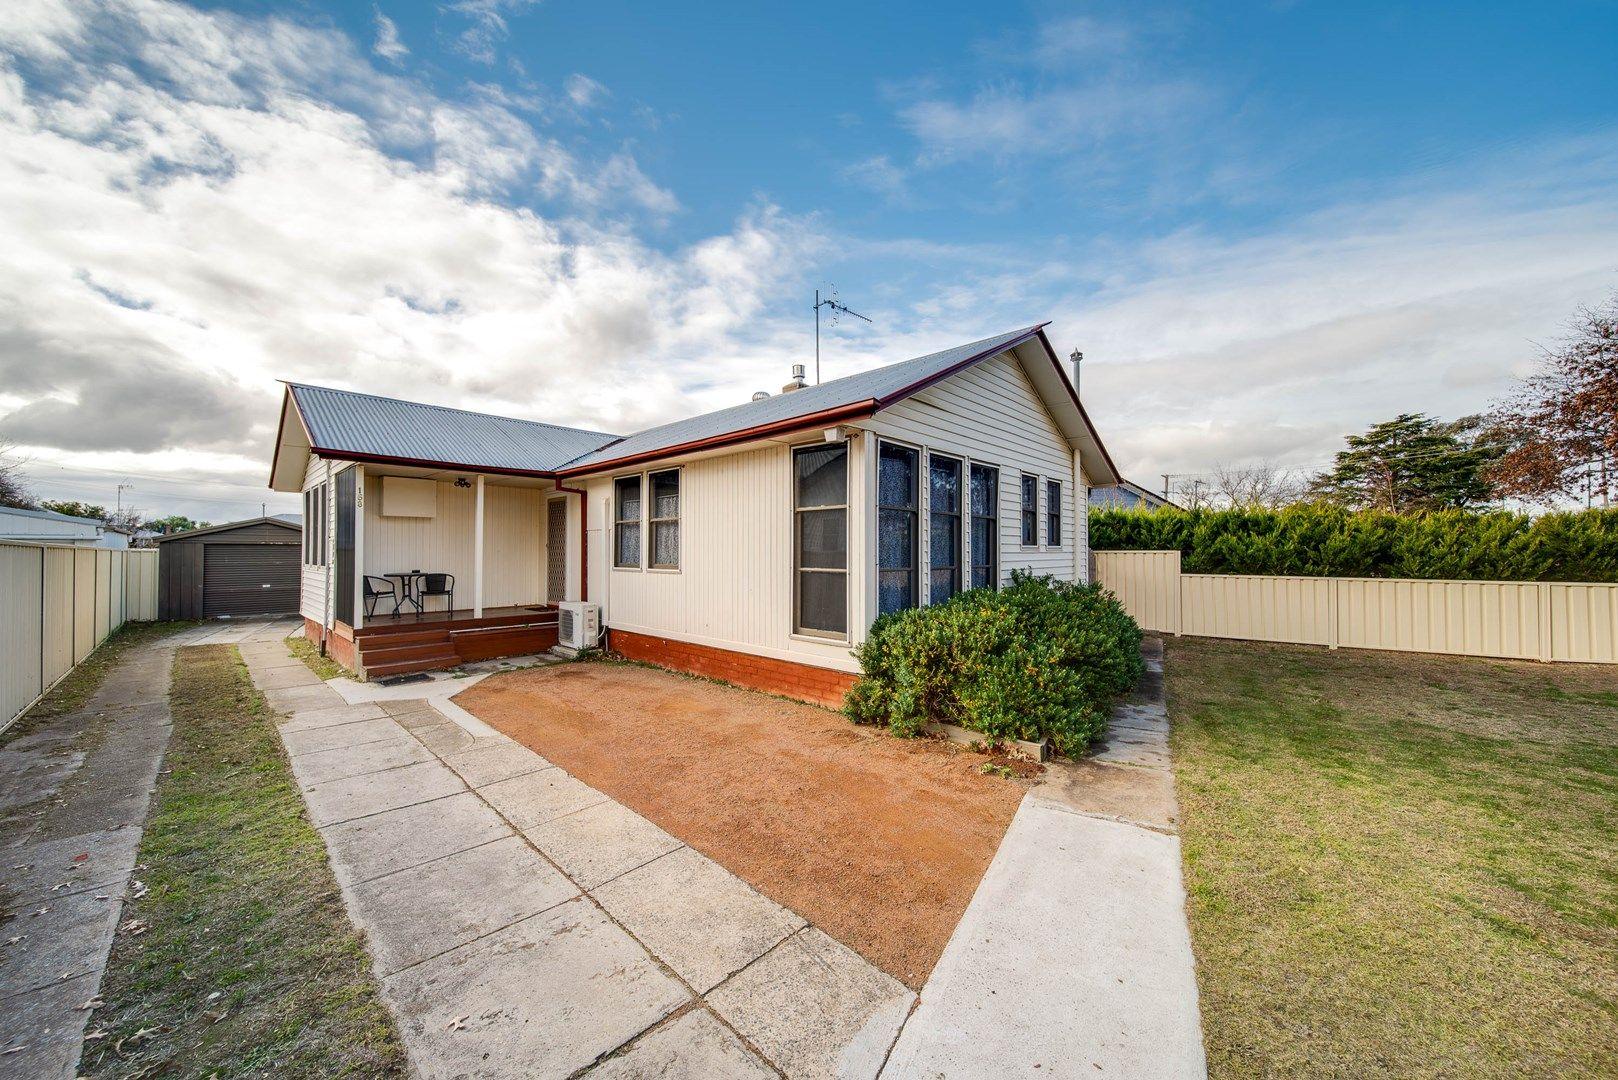 153 Kinghorne St, Goulburn NSW 2580, Image 0